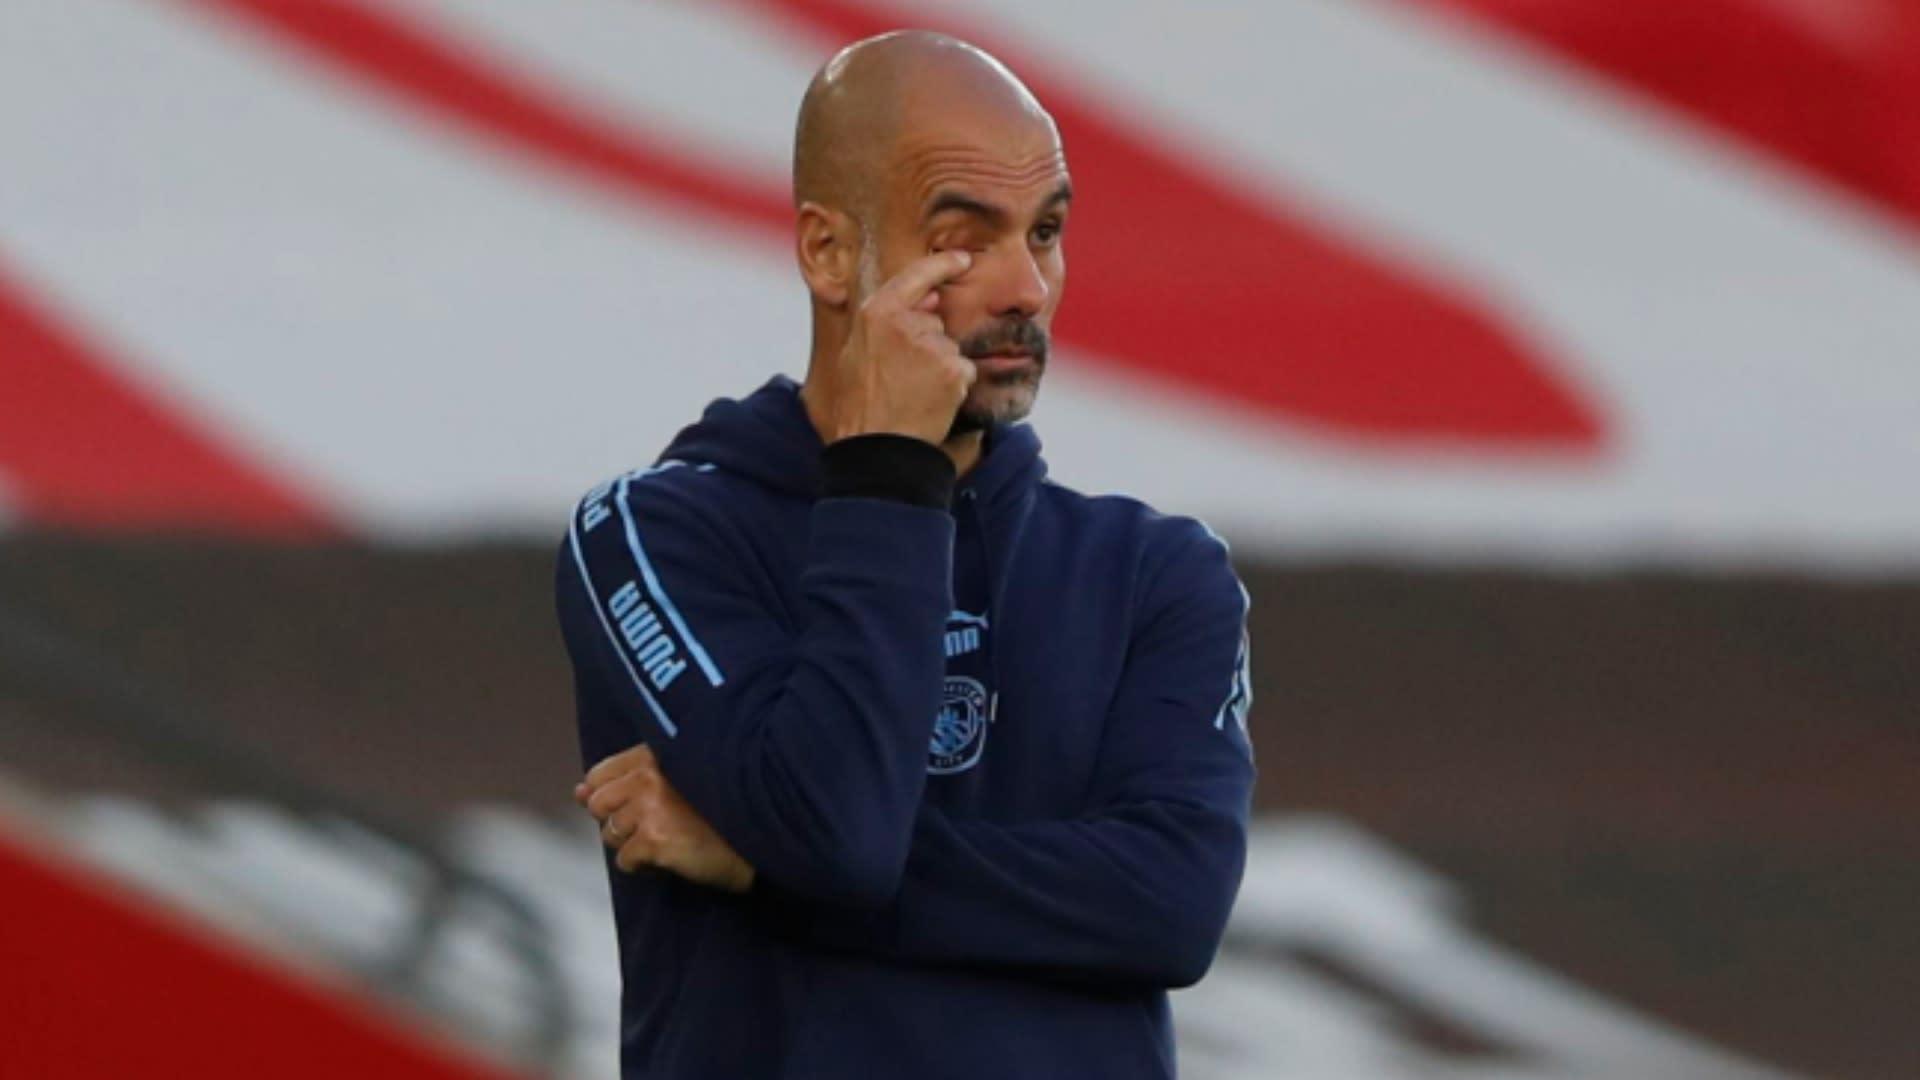 Southampton defeat summed up City's season, says Guardiola